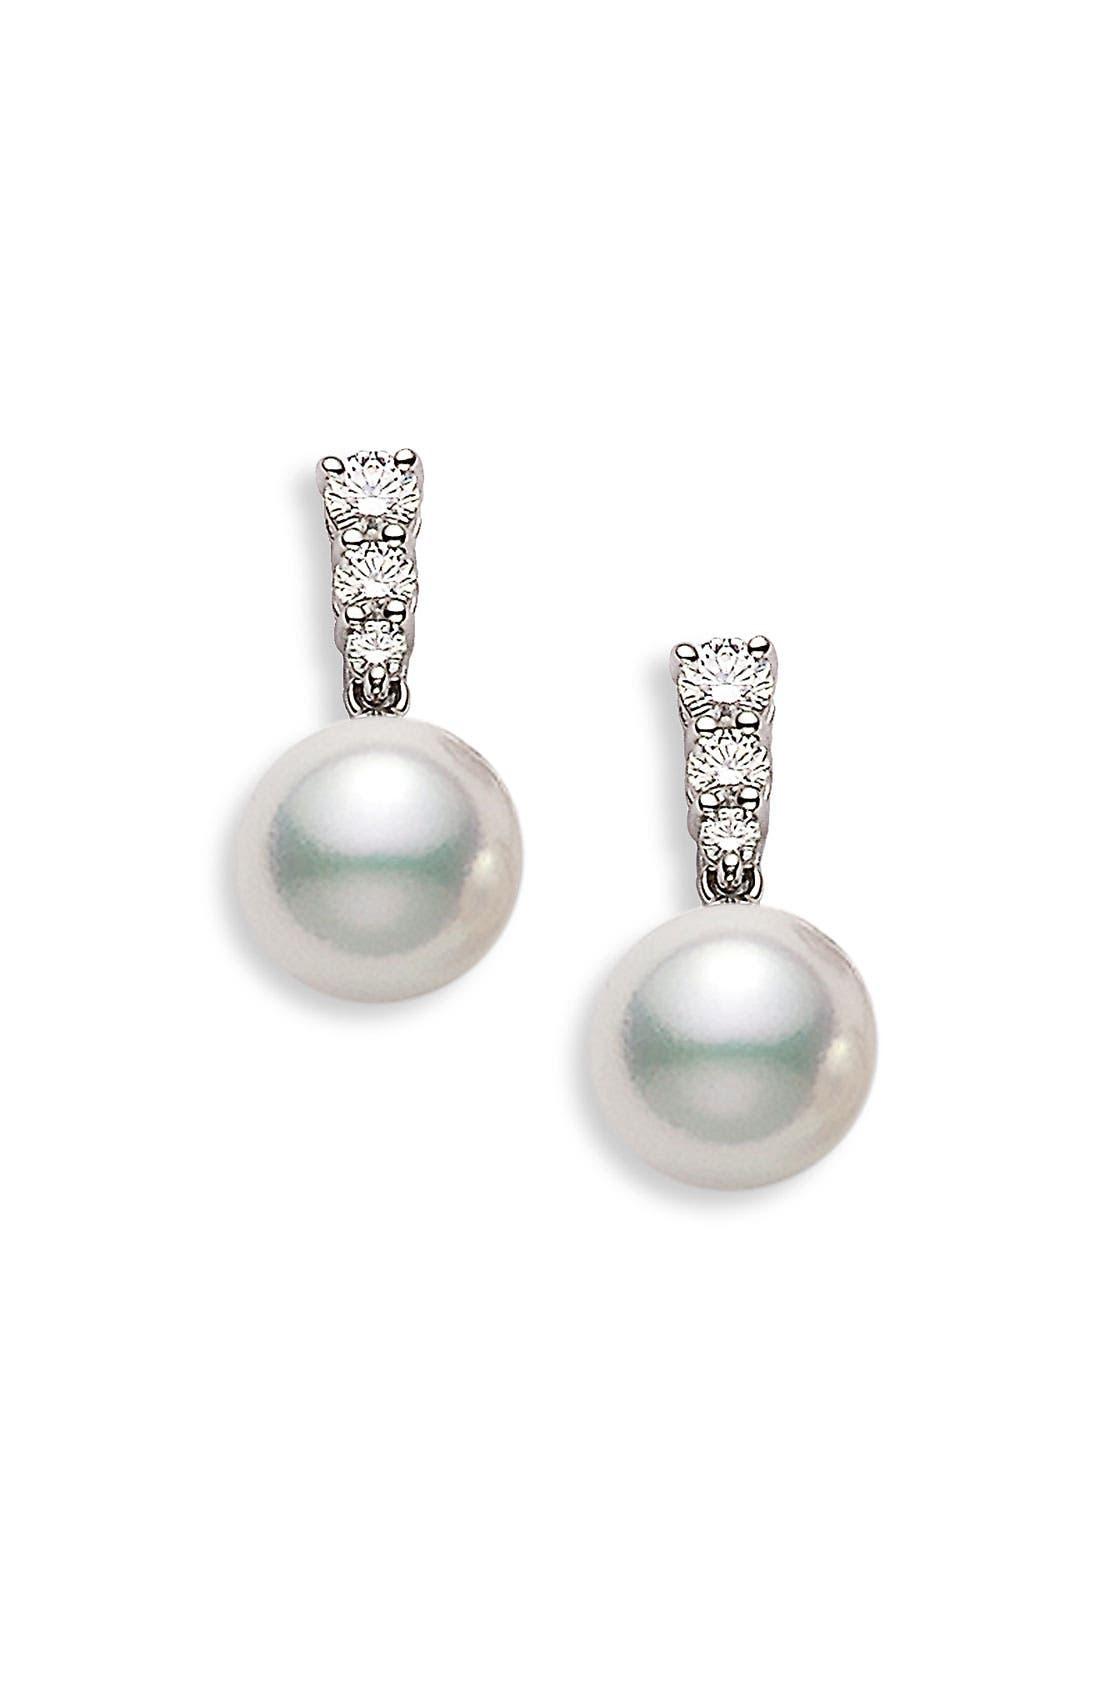 Main Image - Mikimoto 'Morning Dew' Akoya Cultured Pearl & Diamond Earrings